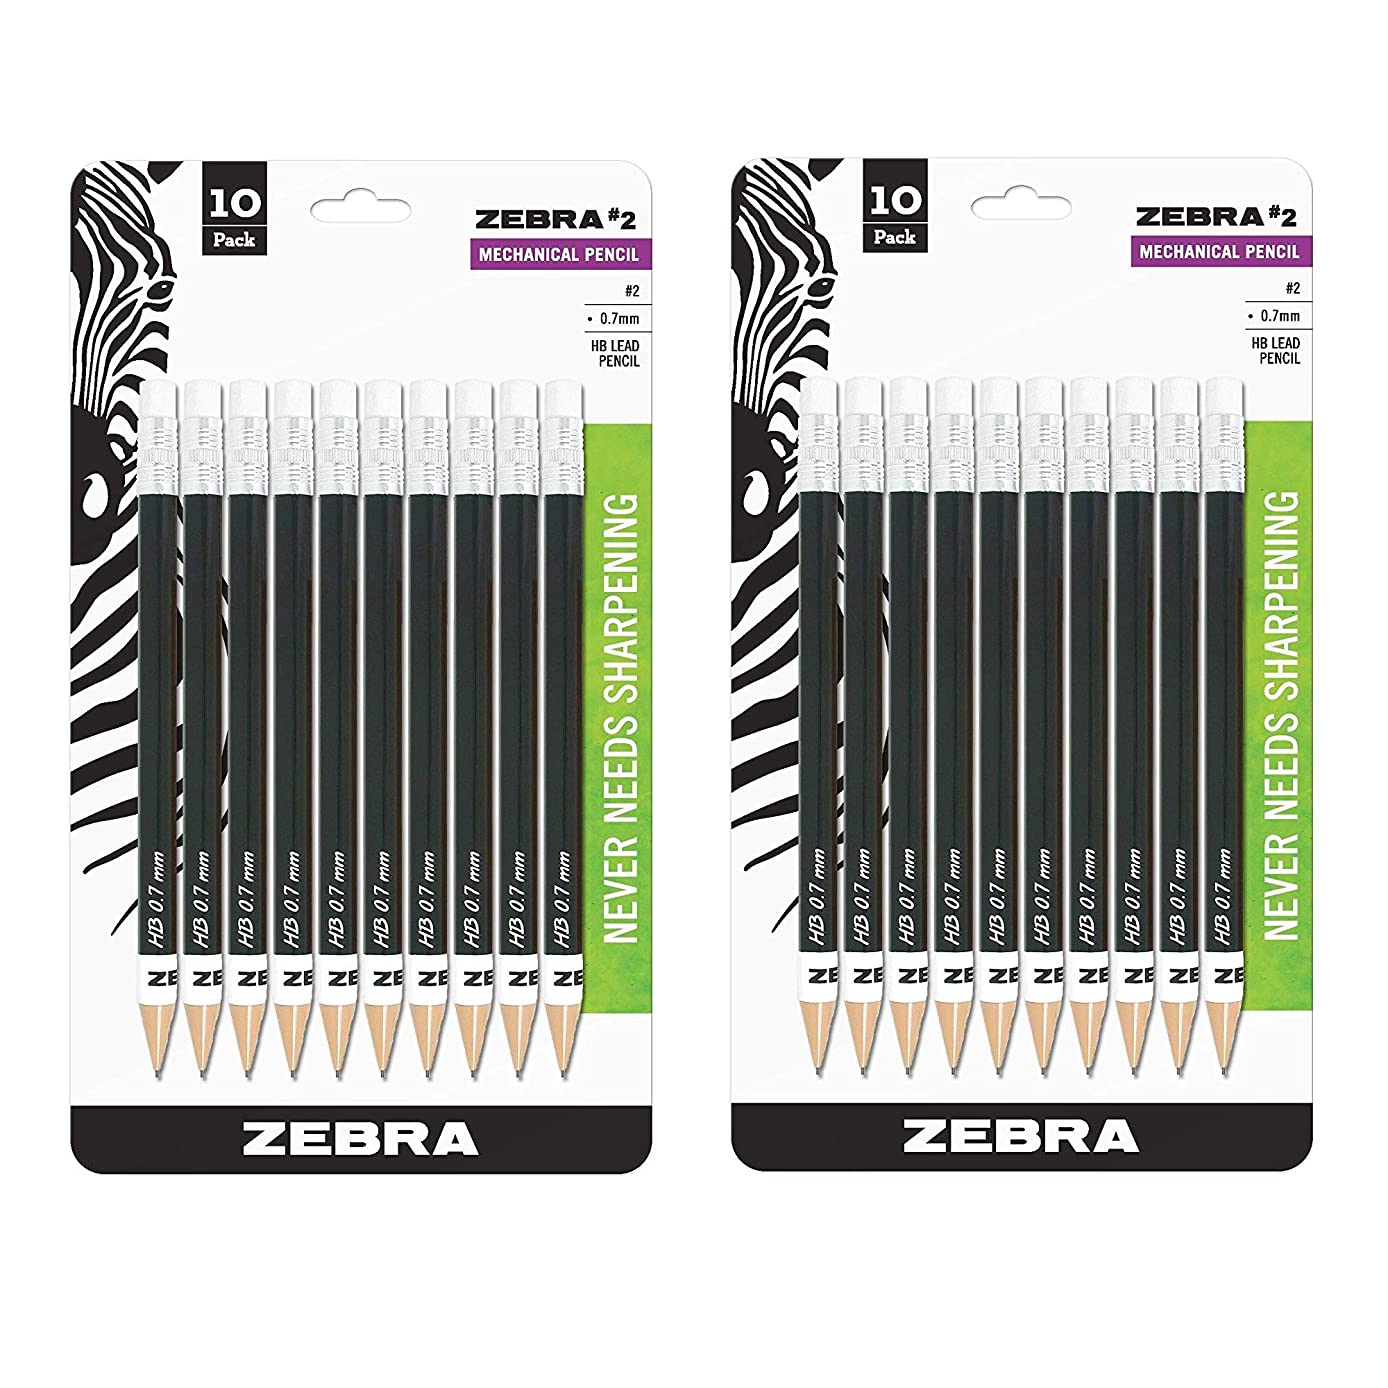 Zebra #2 Mechanical Pencil, 0.7mm Point Size, Standard HB Lead, Black Barrel, 10-Count, 2 PACK